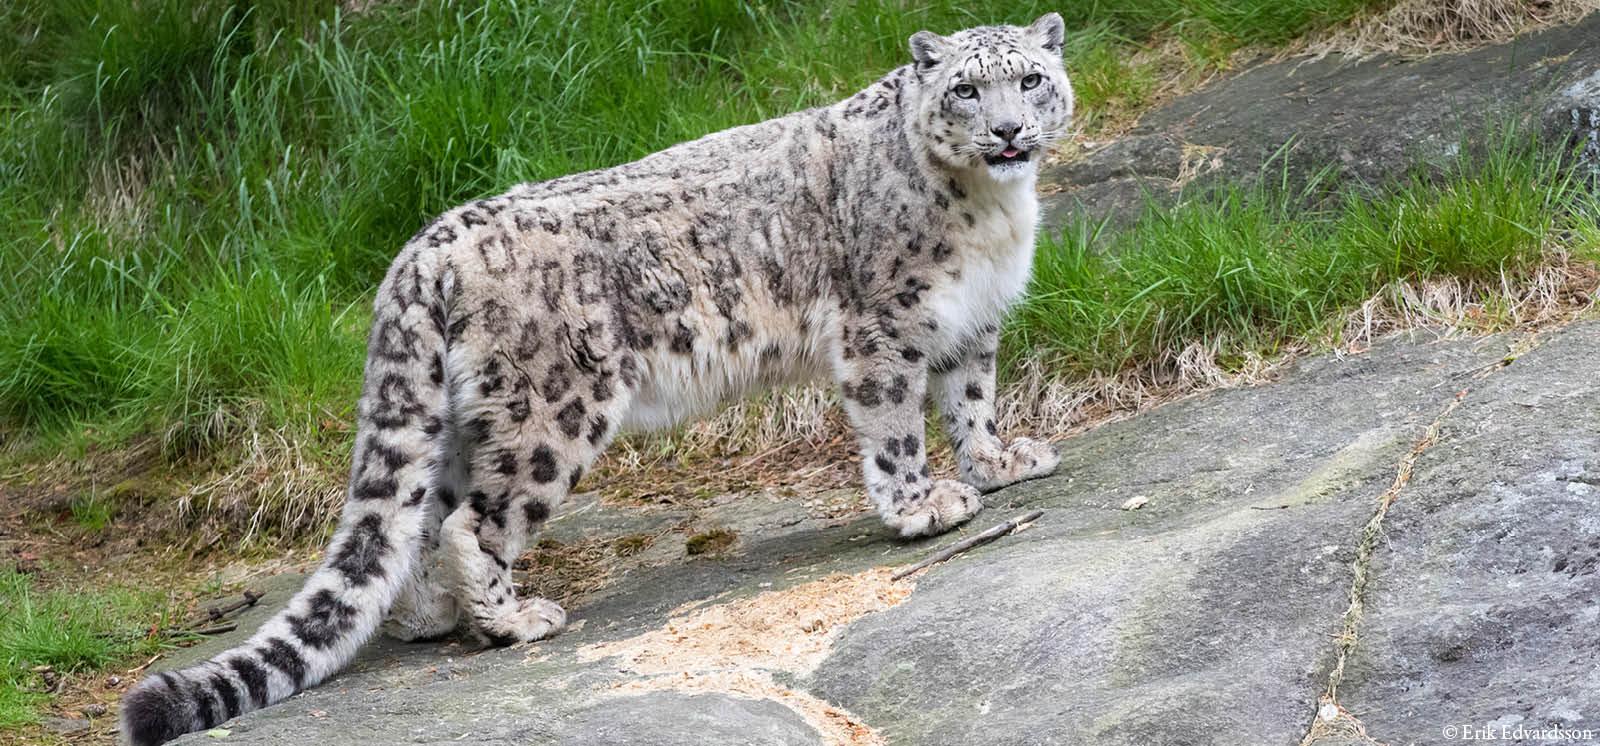 djurbilder1200x560snoleopard.jpg